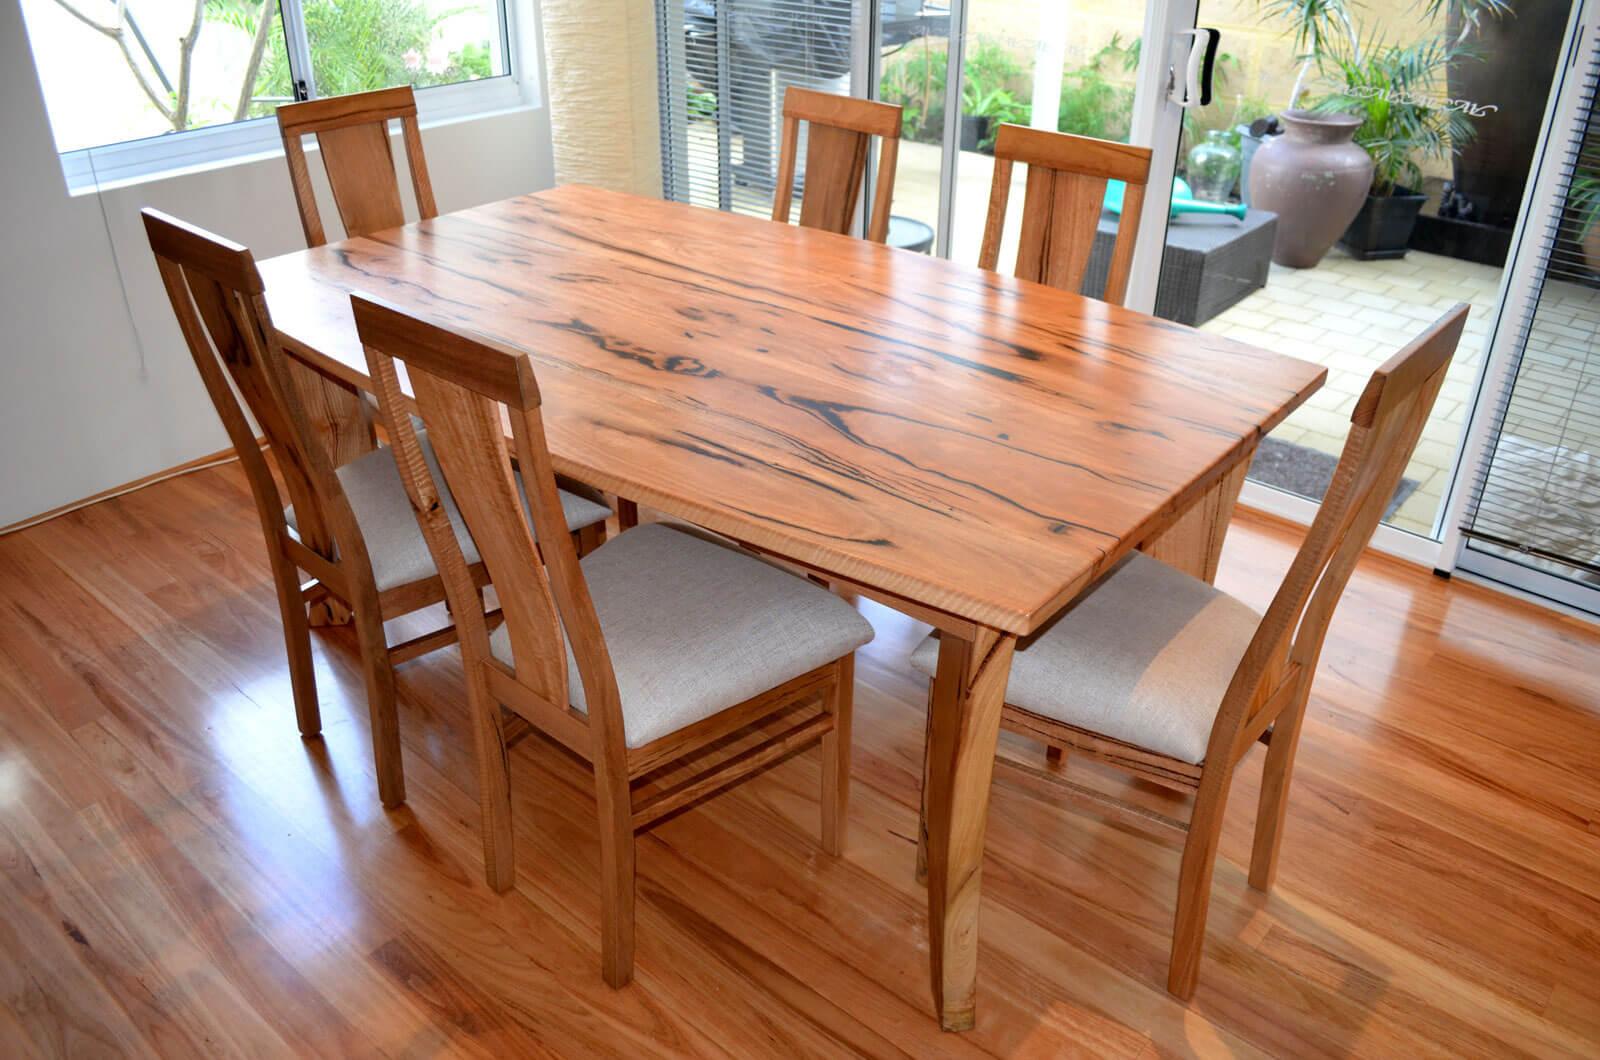 7 Beautiful Native Australian Wood Varieties for Your Interior Design